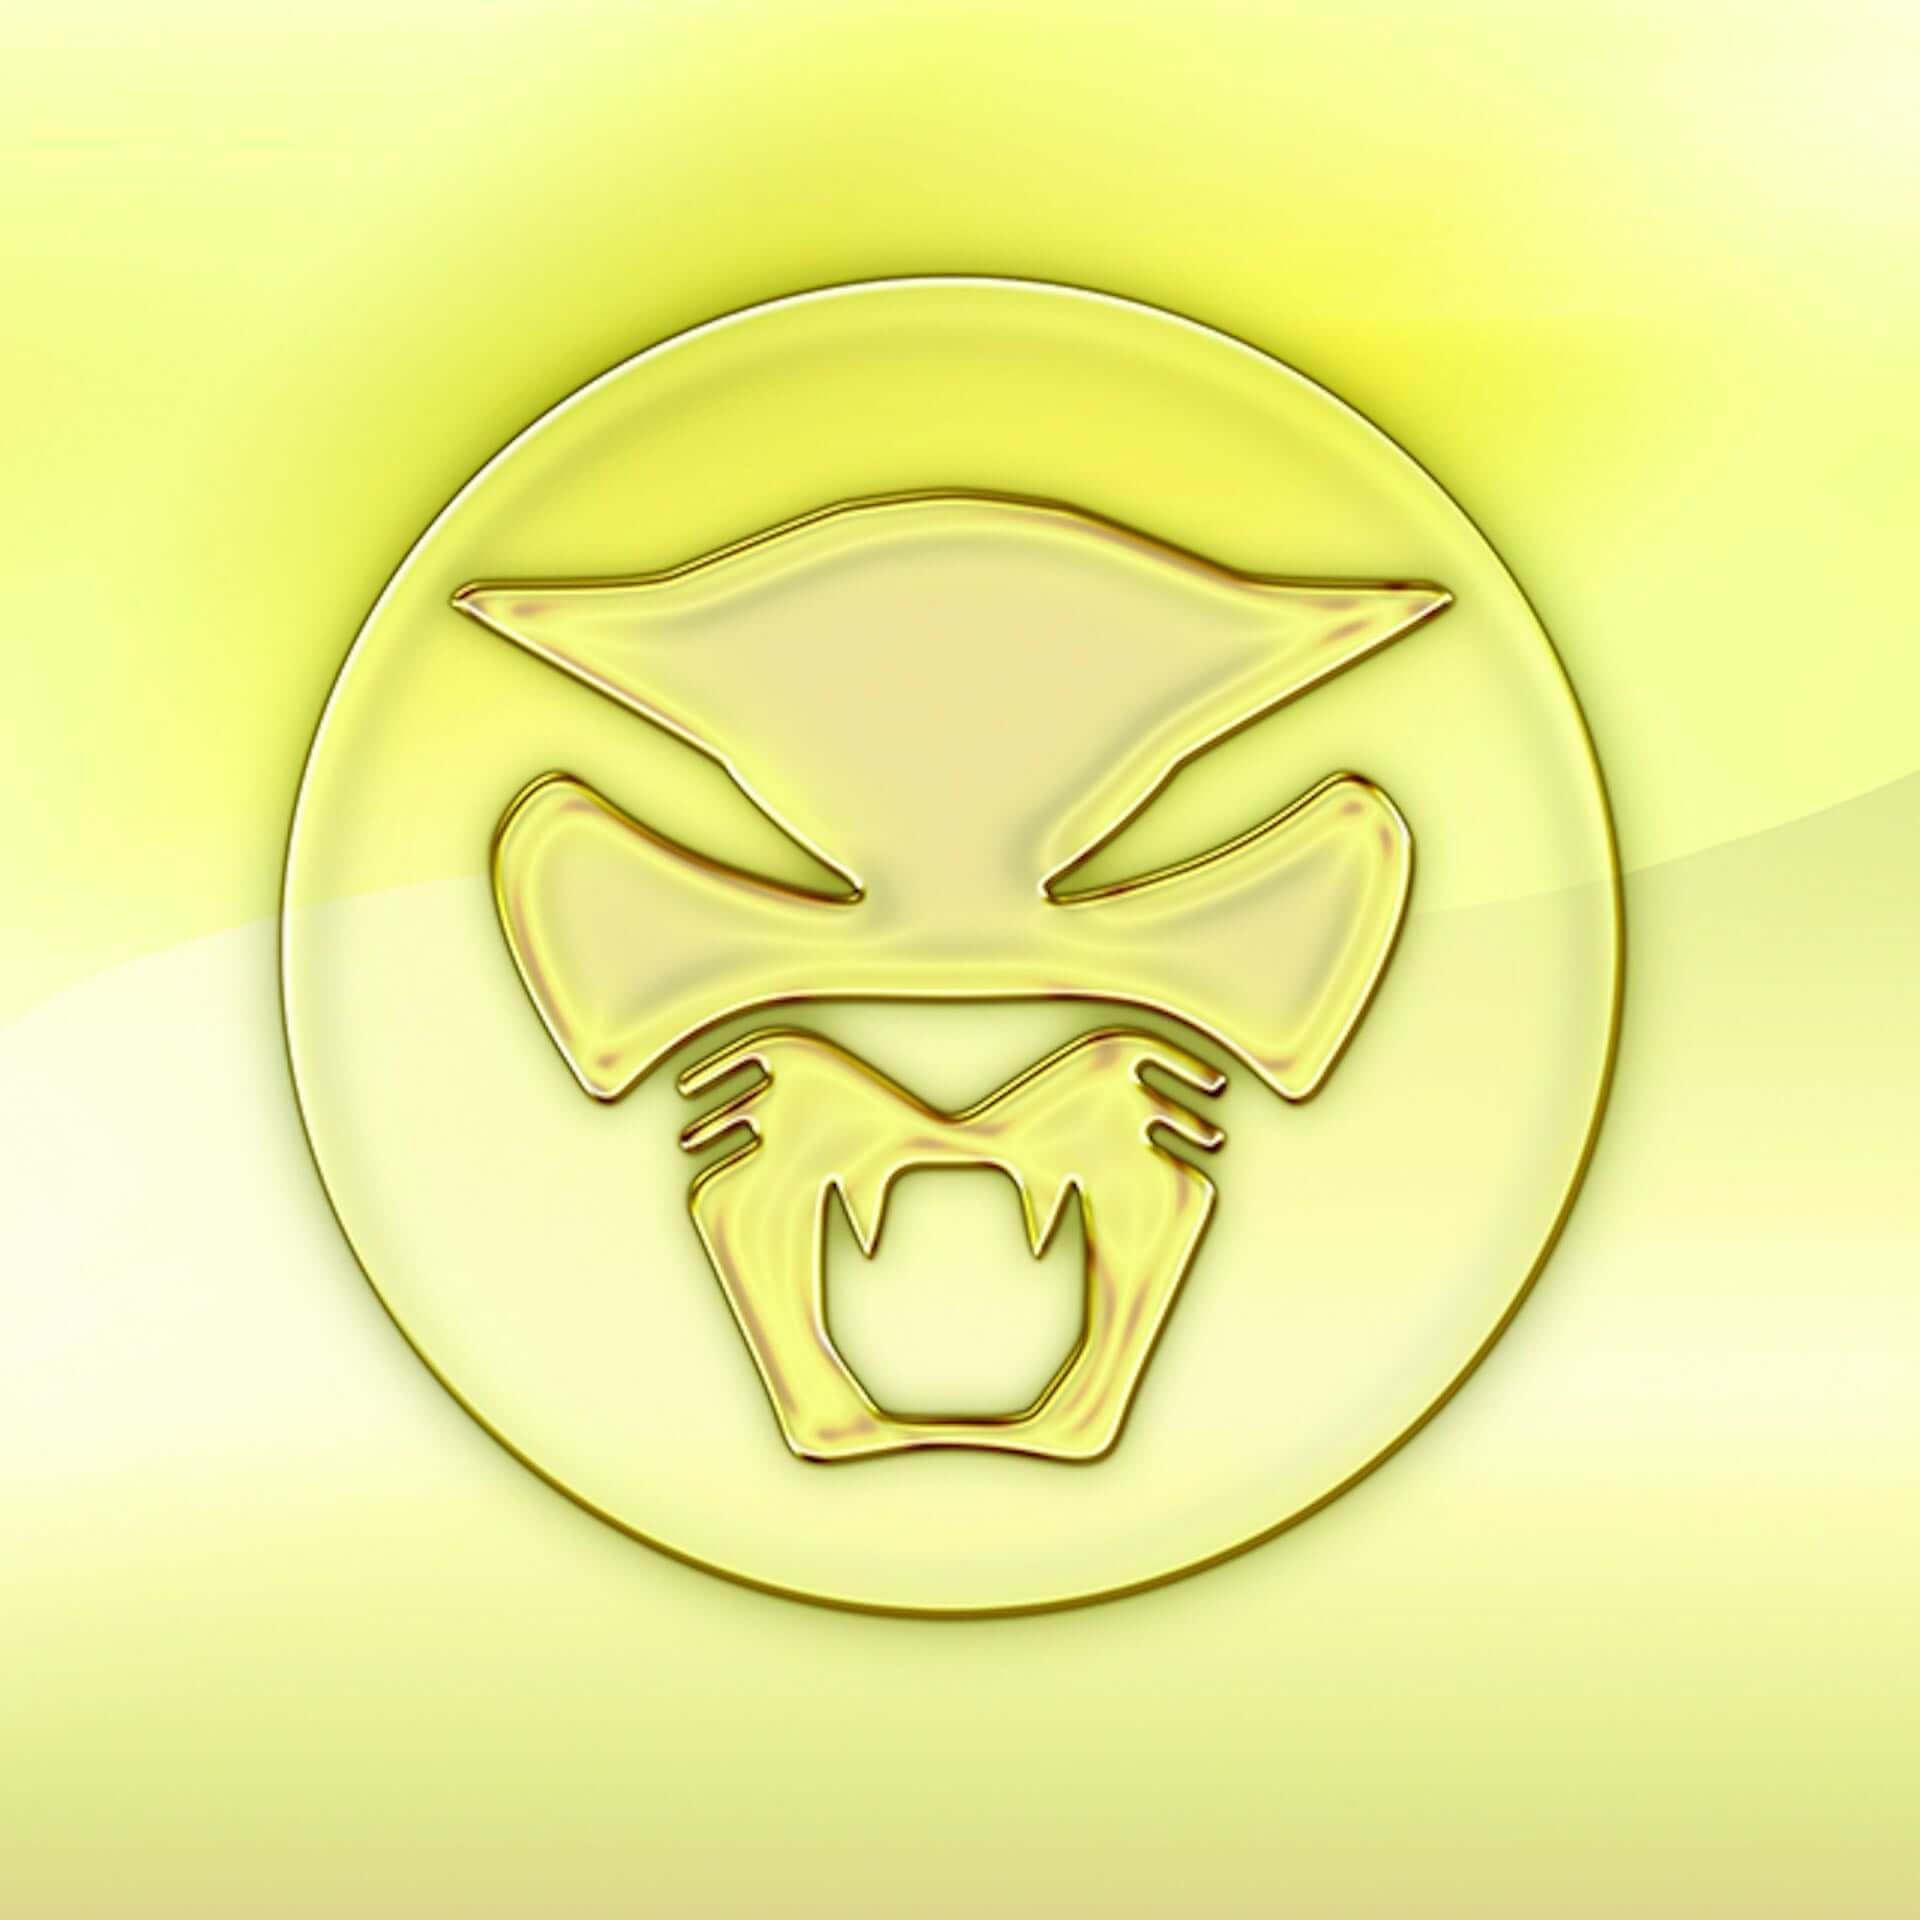 Thundercatが自身の名前の由来となったアニメ『ThunderCats』に楽曲提供!一部視聴可能な動画も公開 music200803_thundercat_8-1920x1920